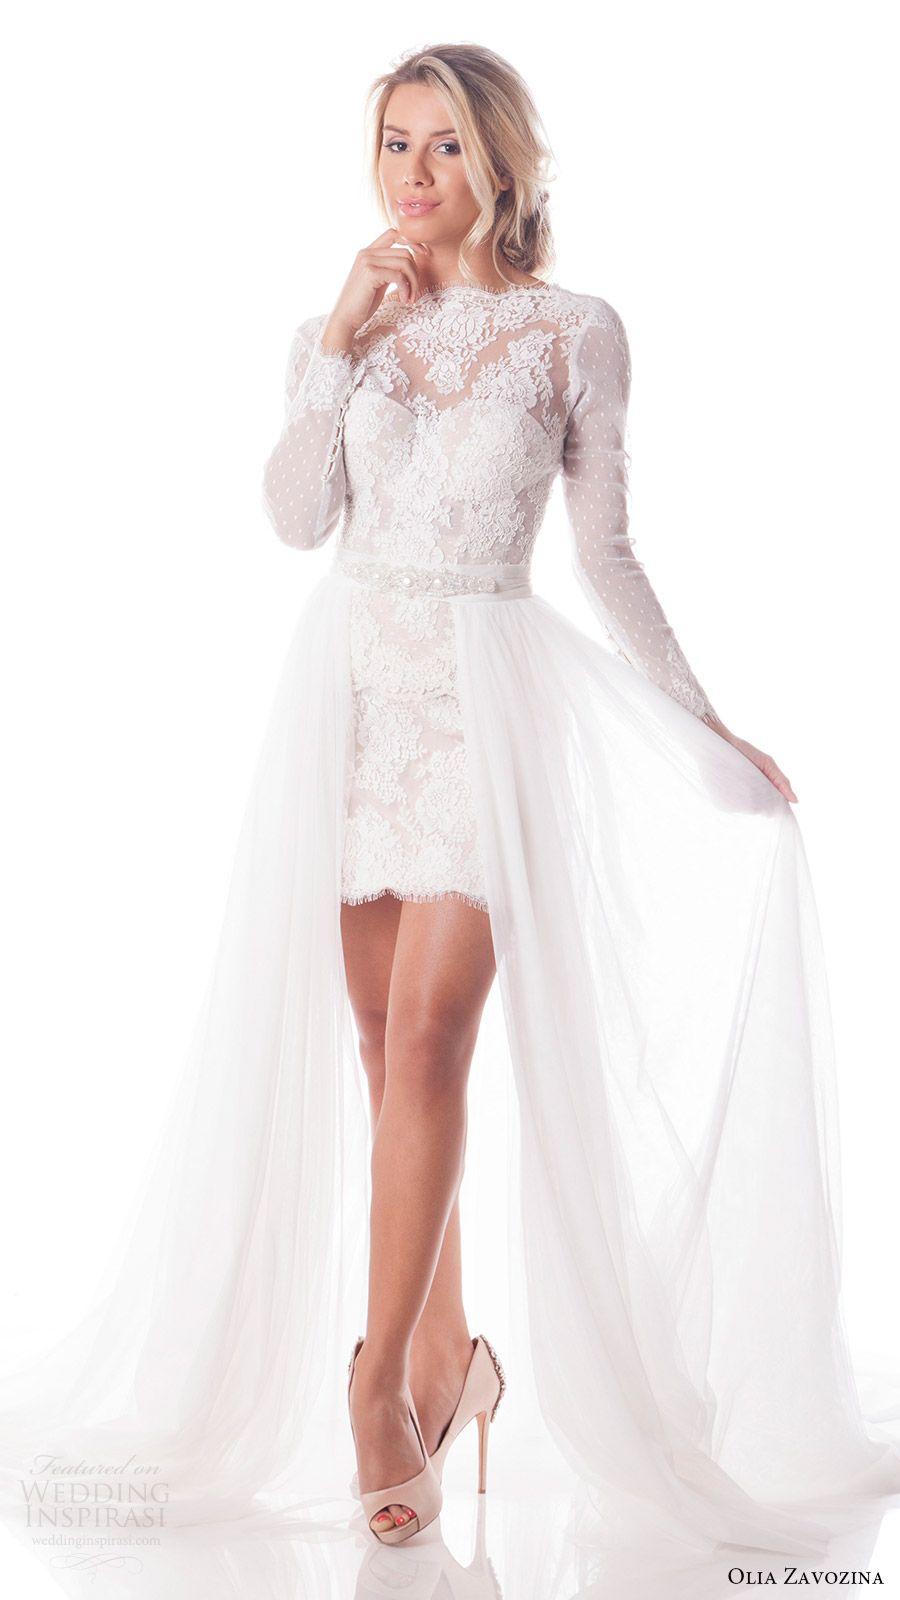 olia zavozina bridal spring 2017 long sleeve lace corset lace mini skirt 3  piece wedding dress (viola) fv tulle overskirt 47c74afd4cdb